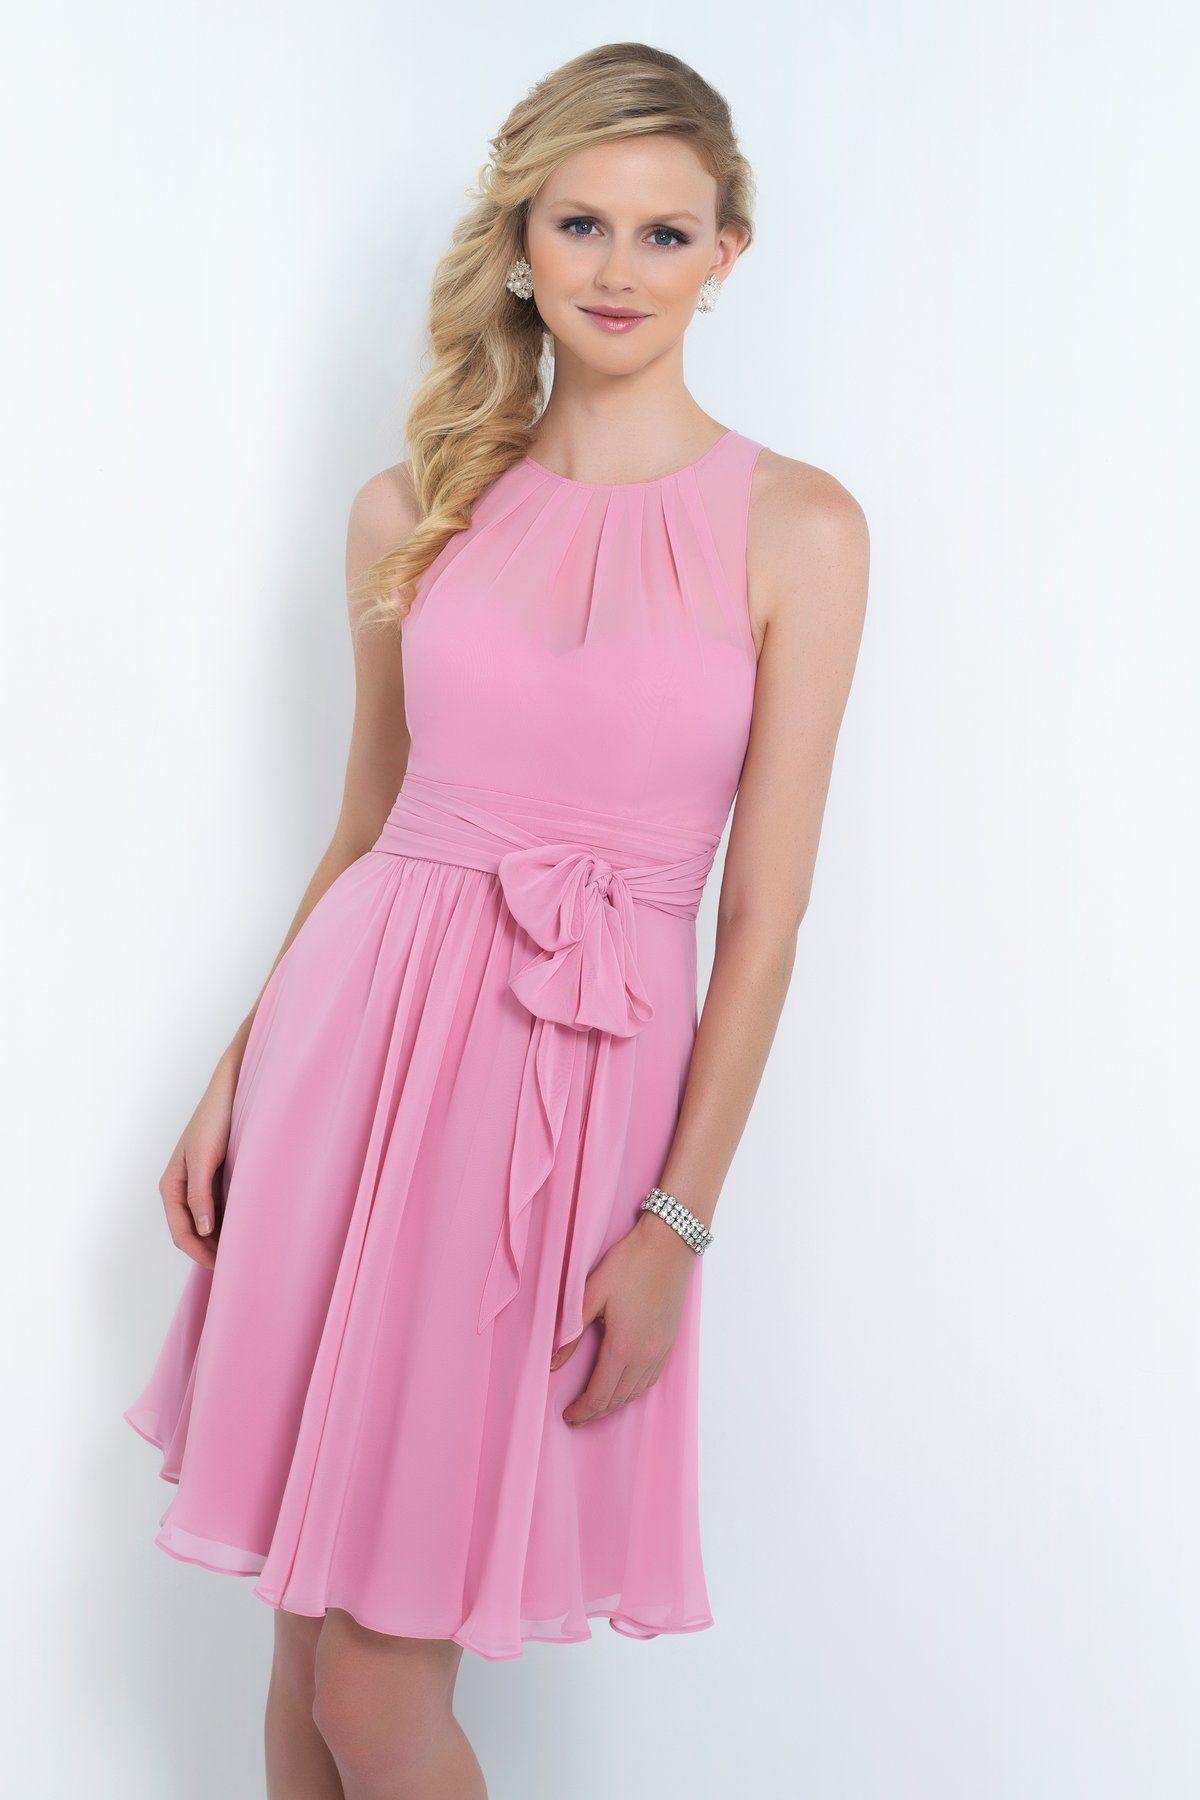 Alexia designs style bella chiffon bridesmaid dress with